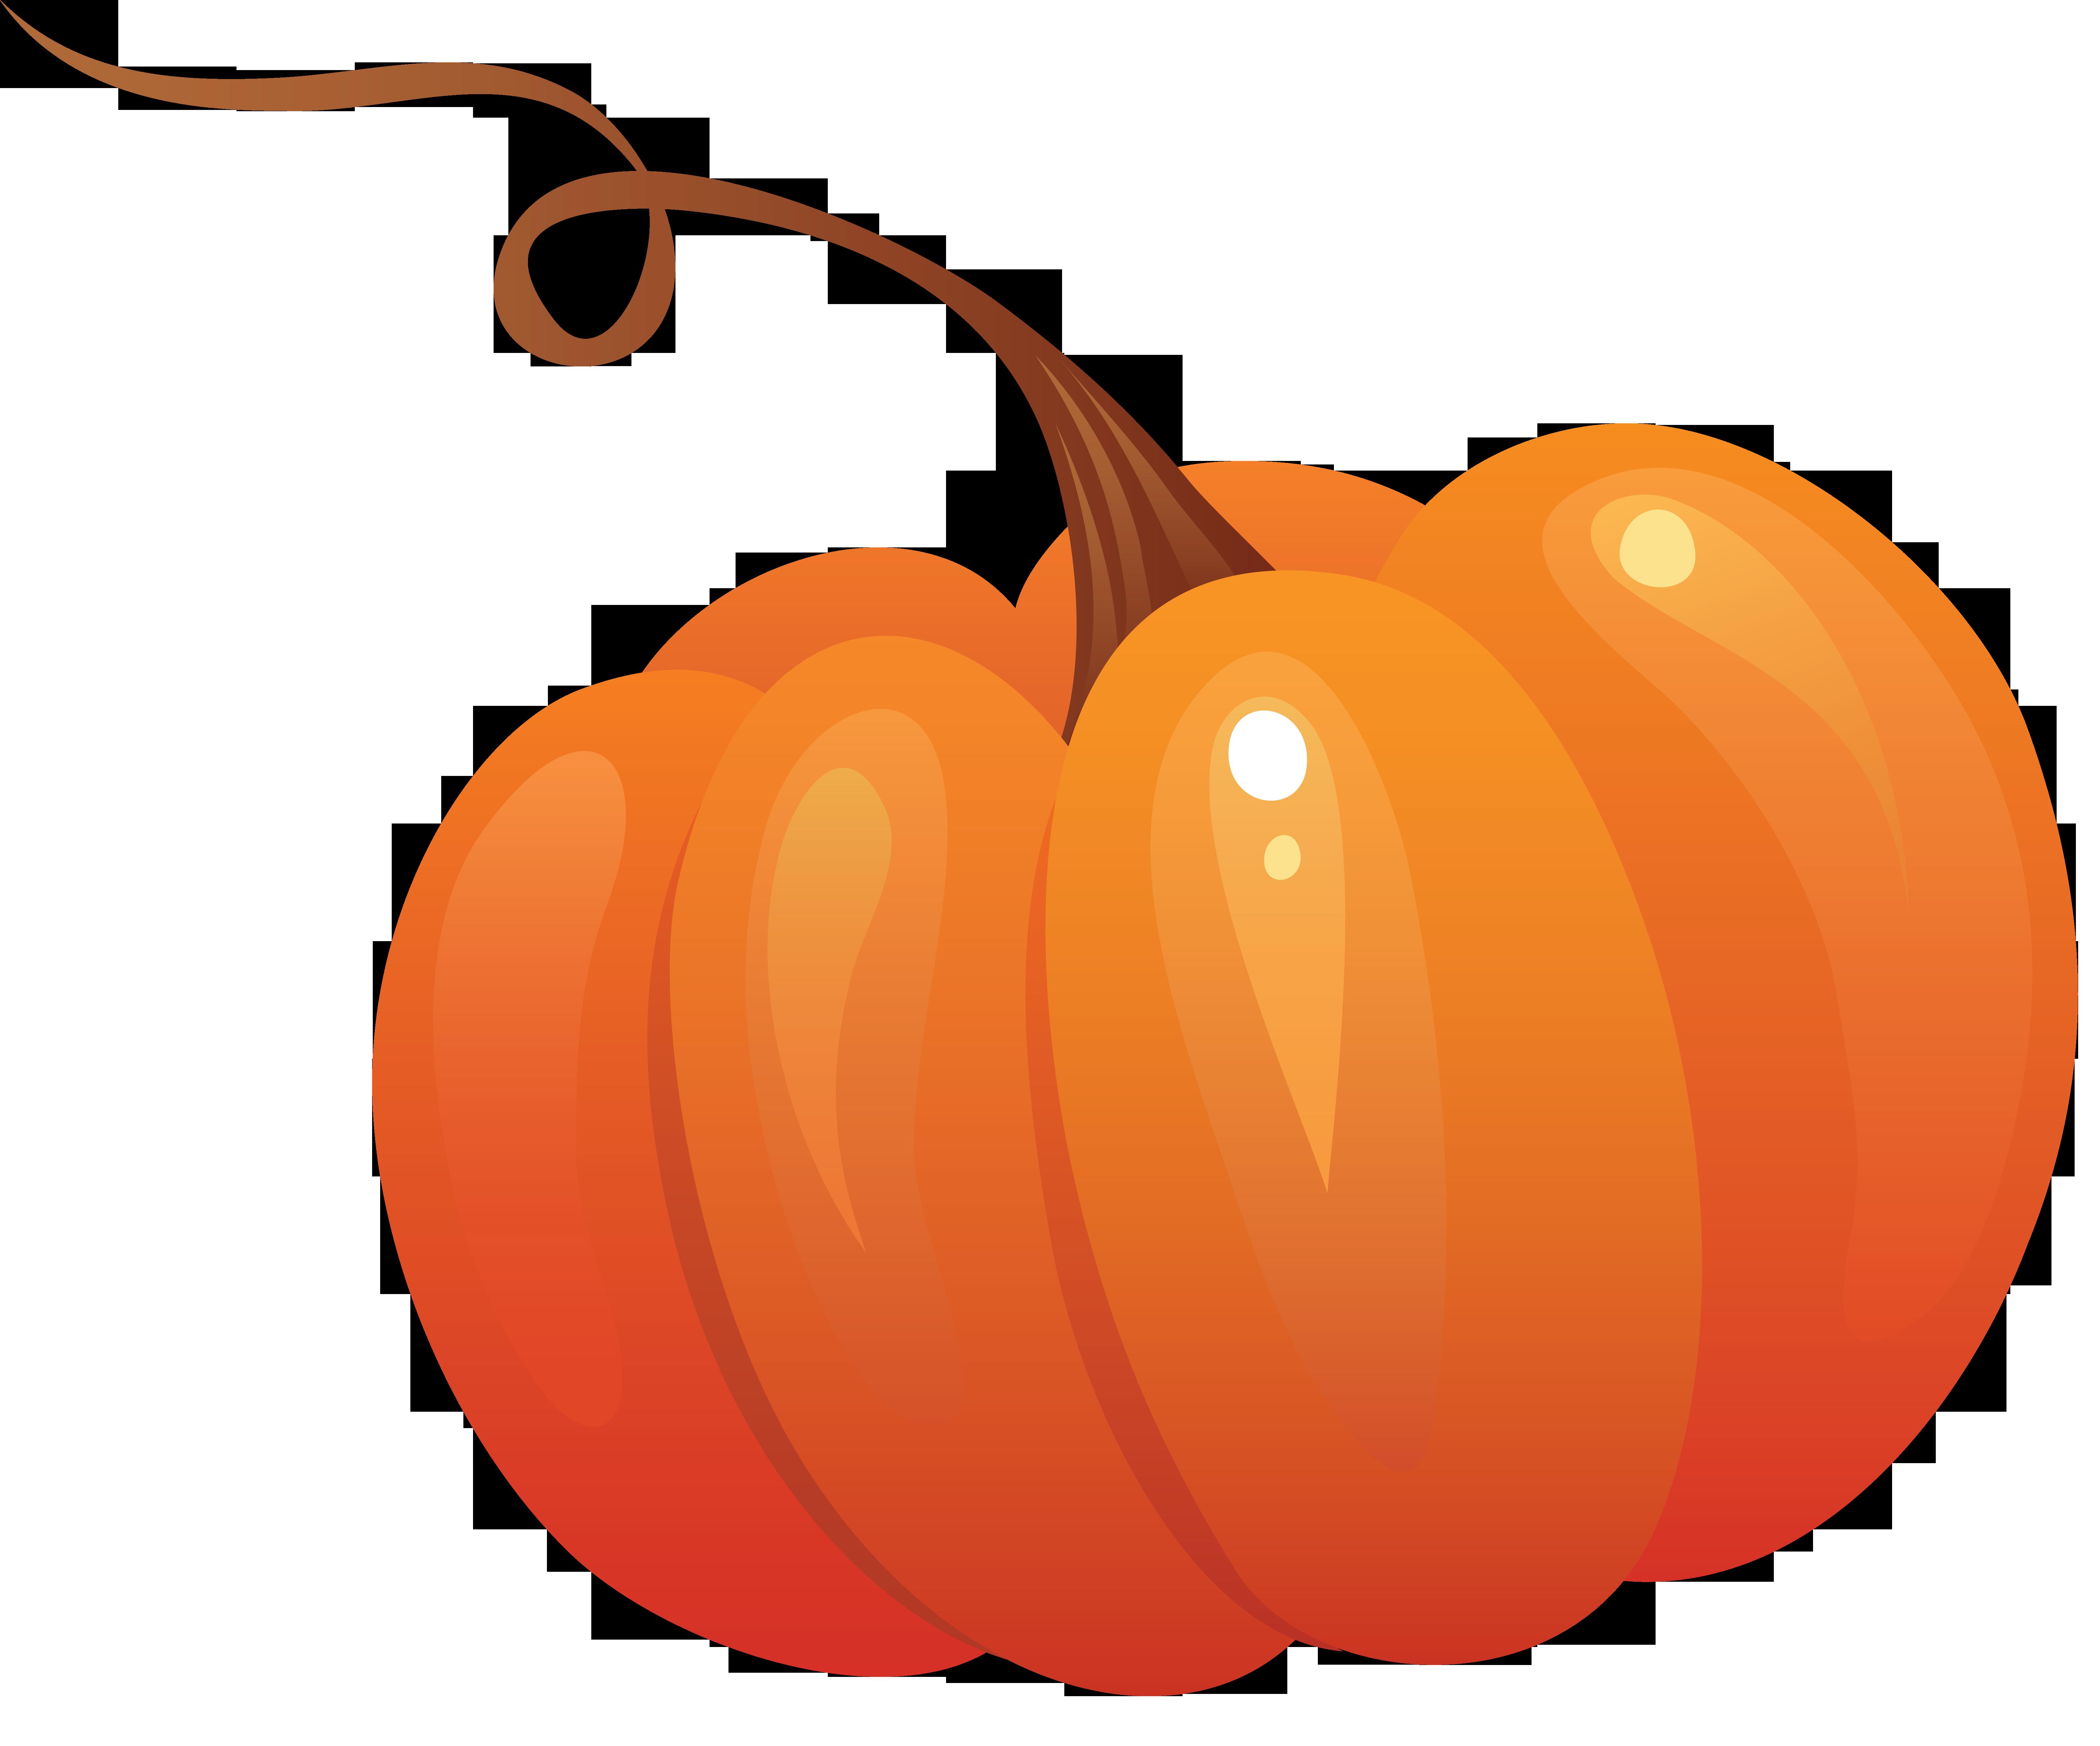 Pumpkin Png Image Pumpkin Png Halloween Pumpkin Images Pumpkin Images